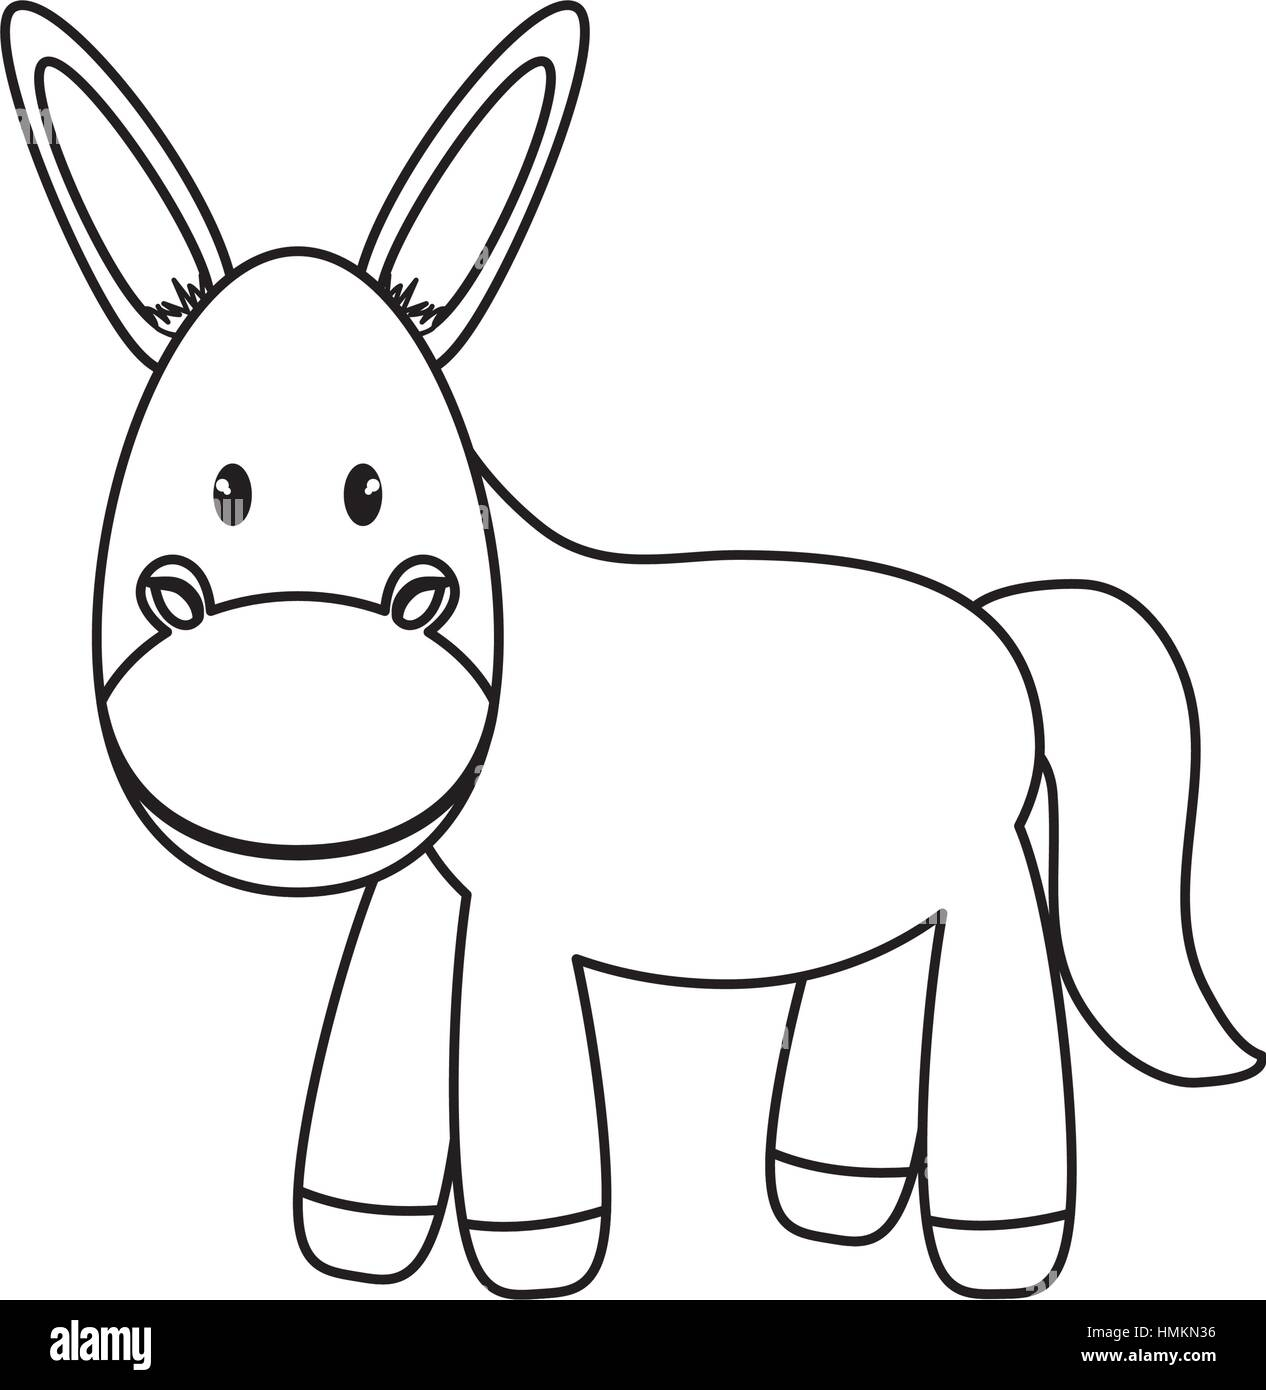 Donkey Puppy Stock Photos & Donkey Puppy Stock Images - Alamy